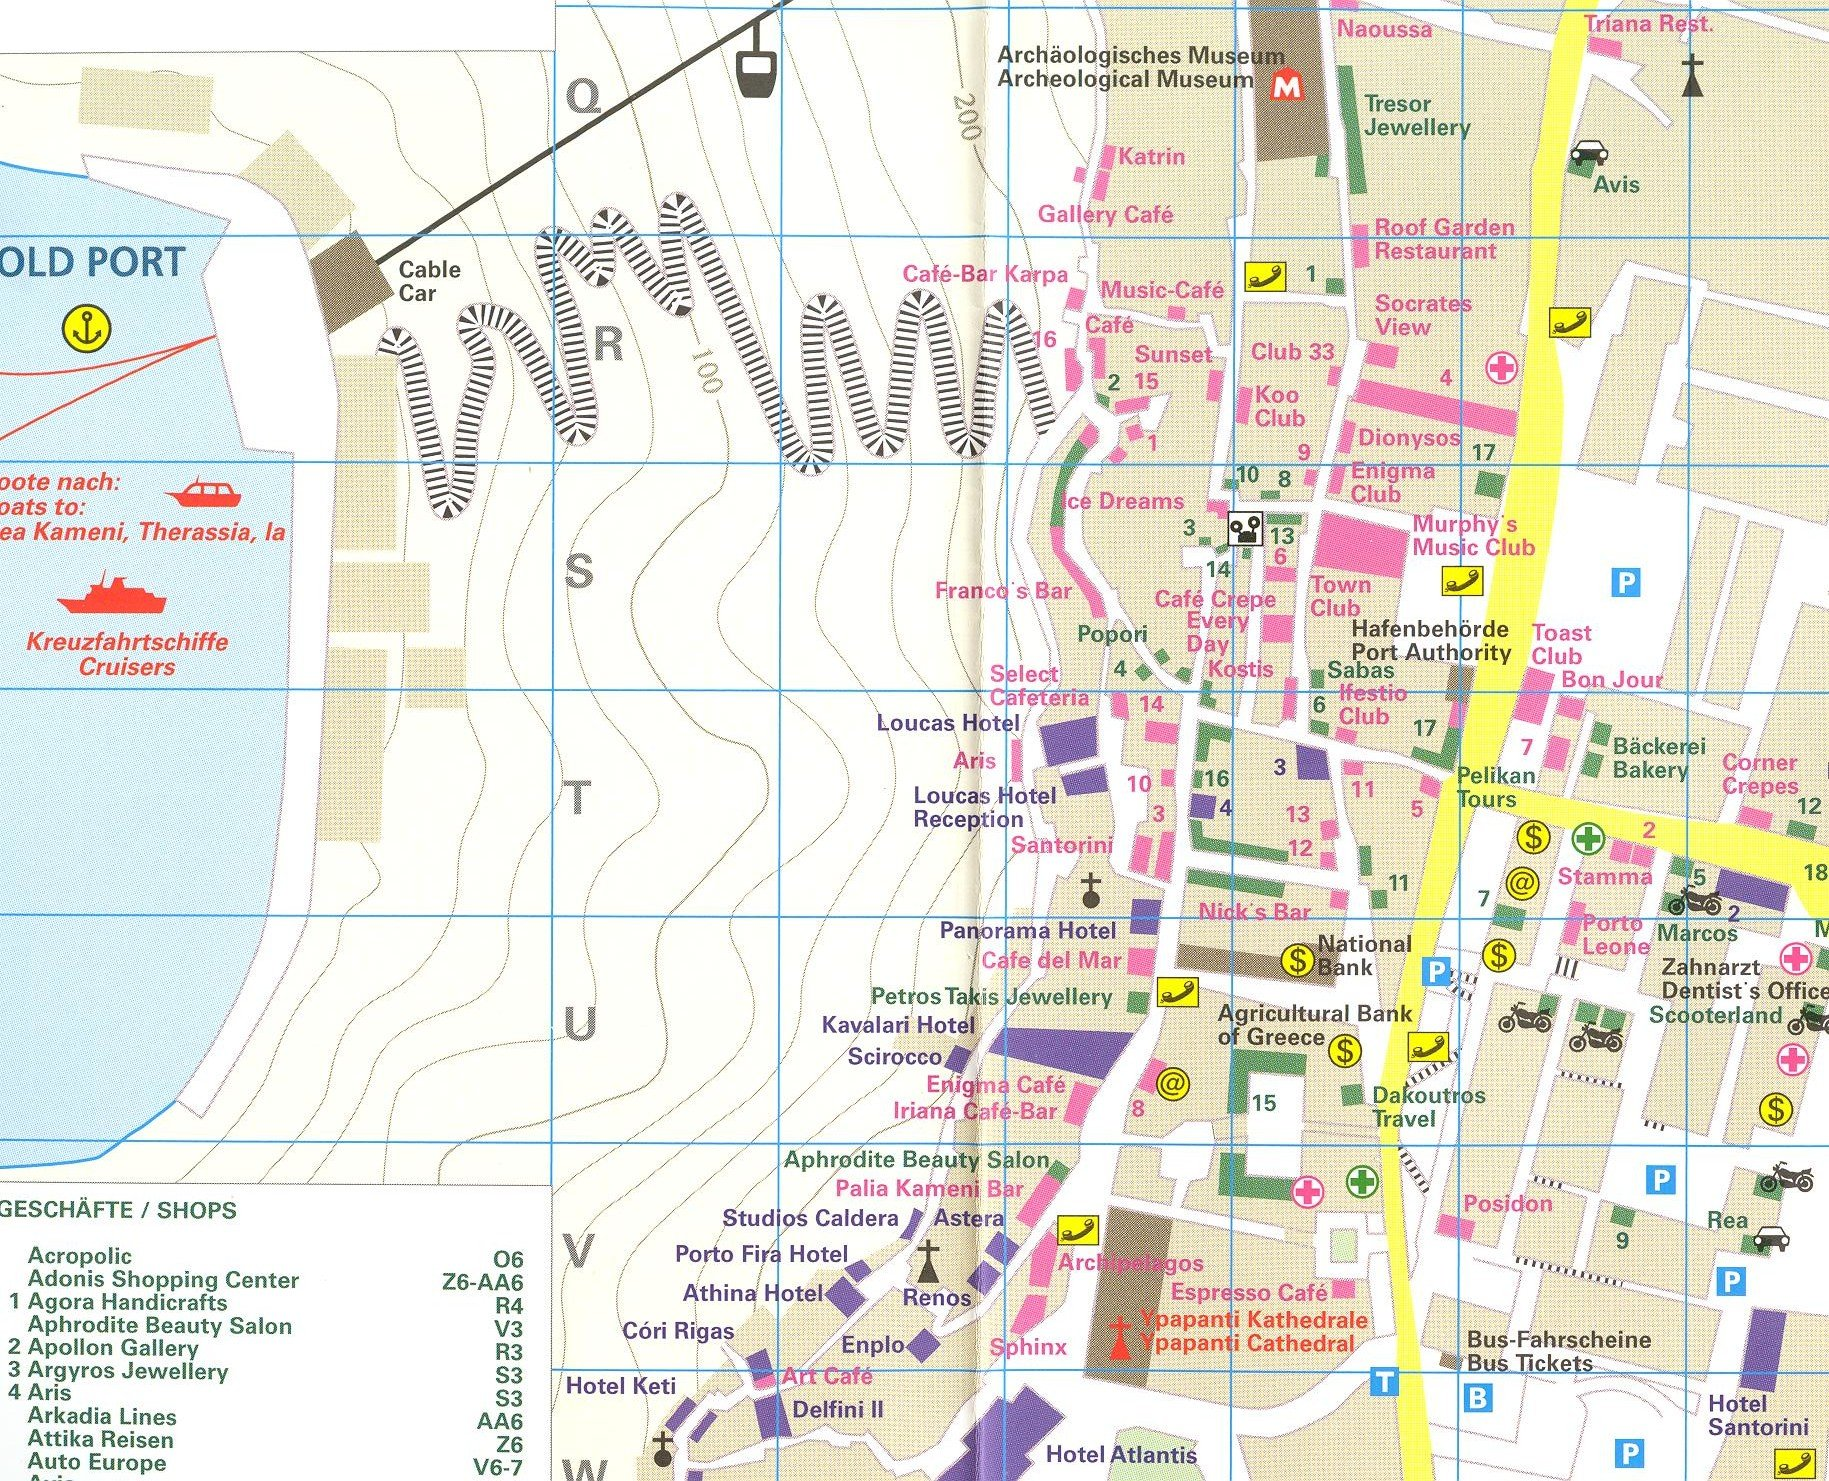 Santorini Greece 125 000 Visitors Map with street plans REISE